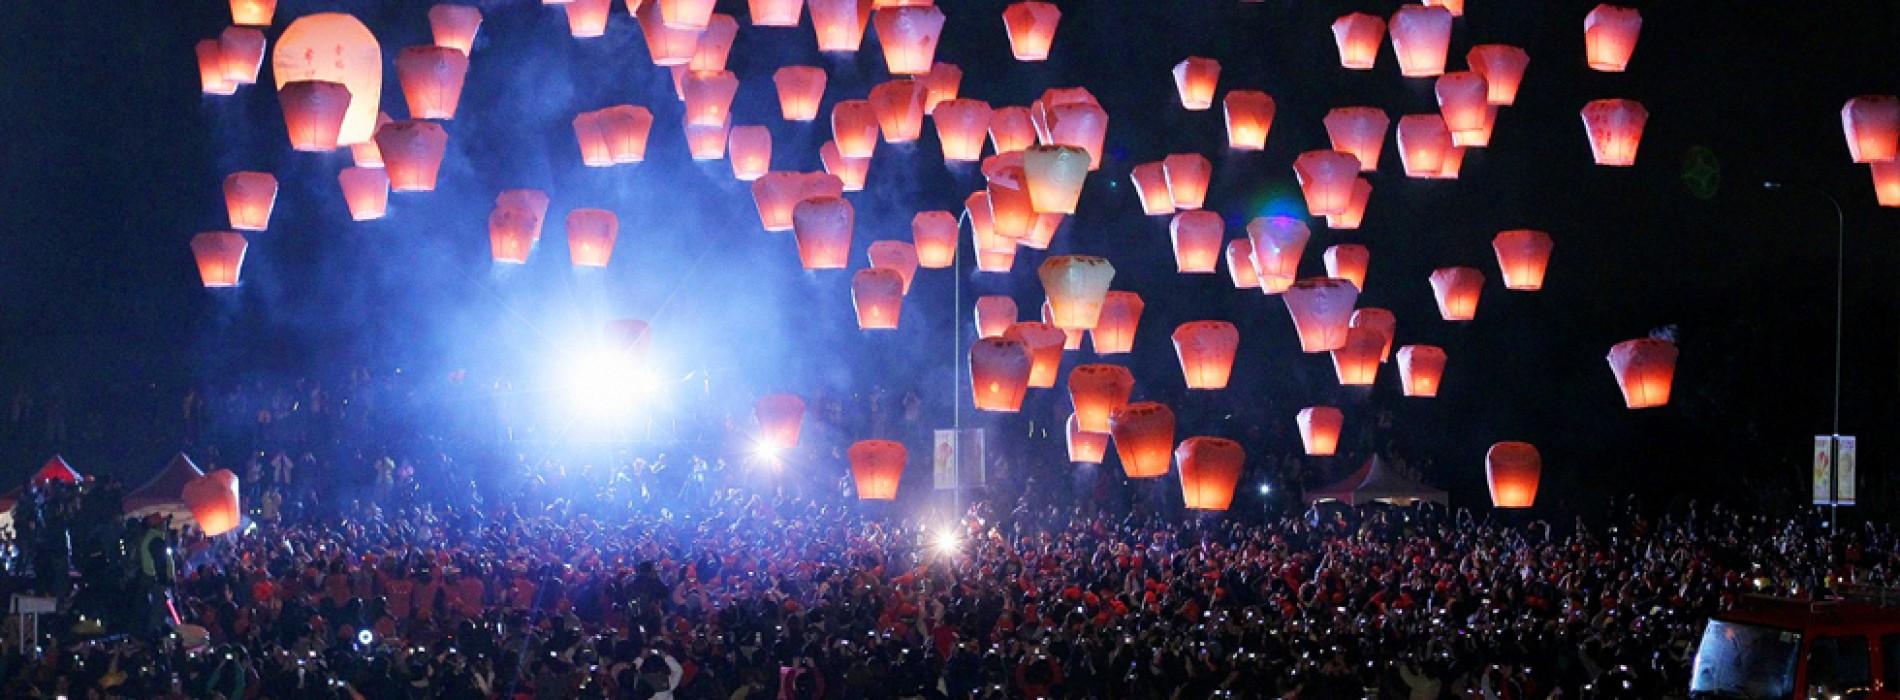 Celebrate the 2018 Taiwan Lantern Festival!